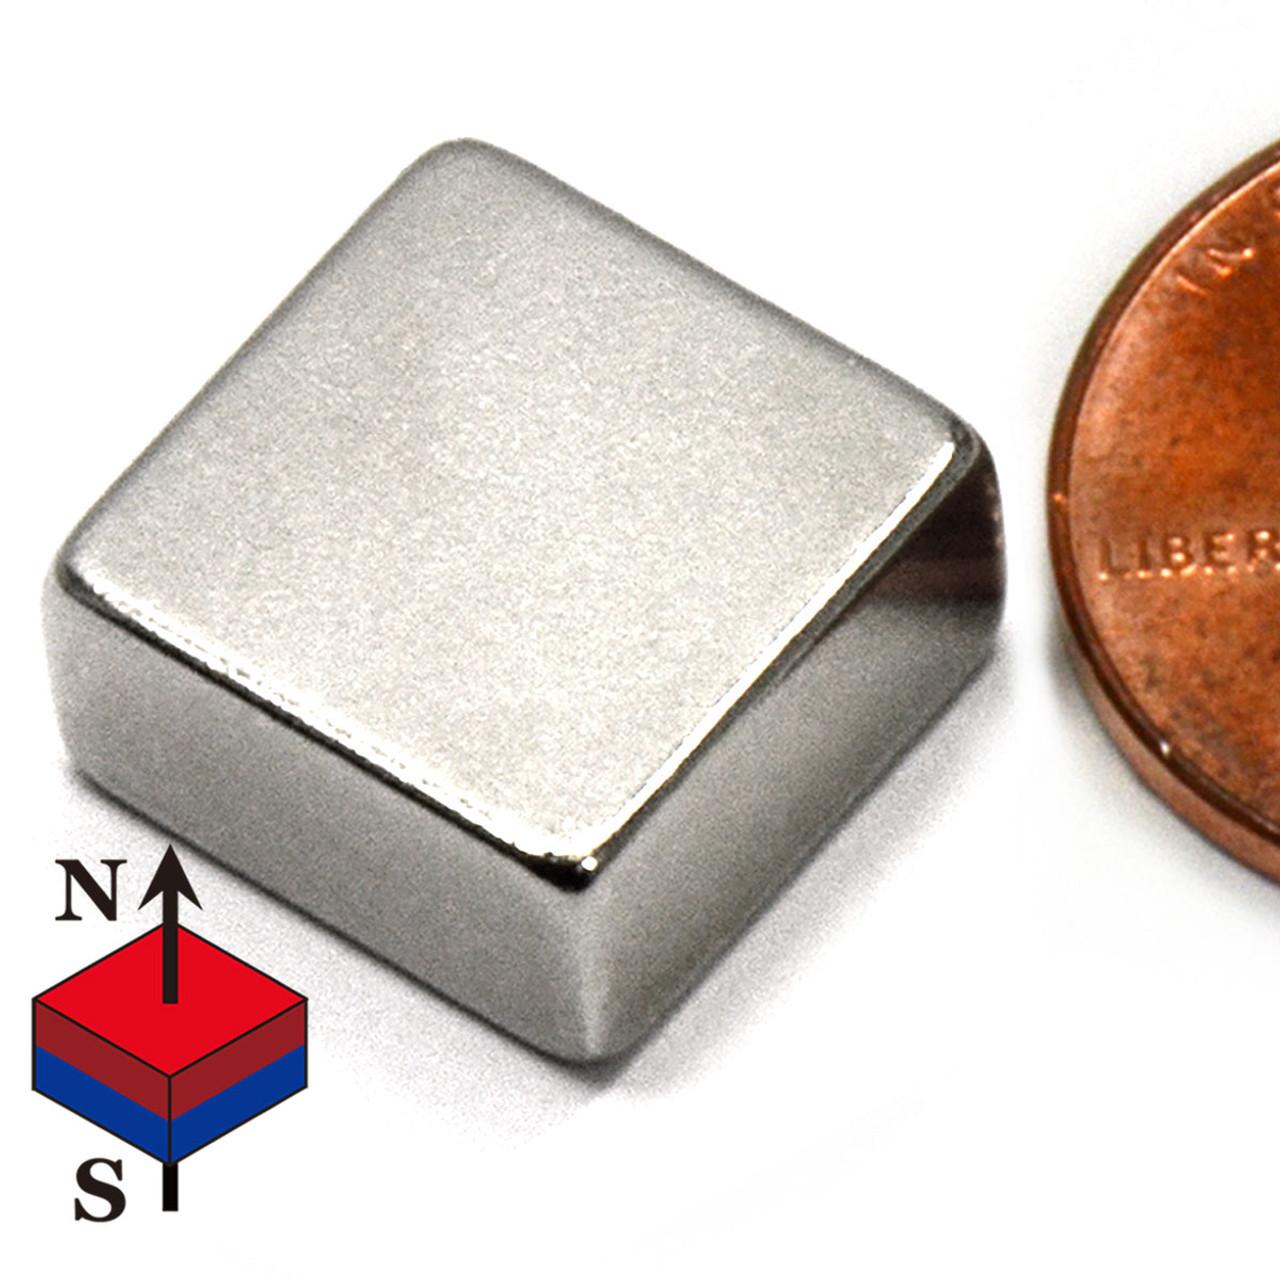 N52 N50 Super Strong Block Magnetic Rare Earth NdFeB Neodymium Cube Bar Magnets